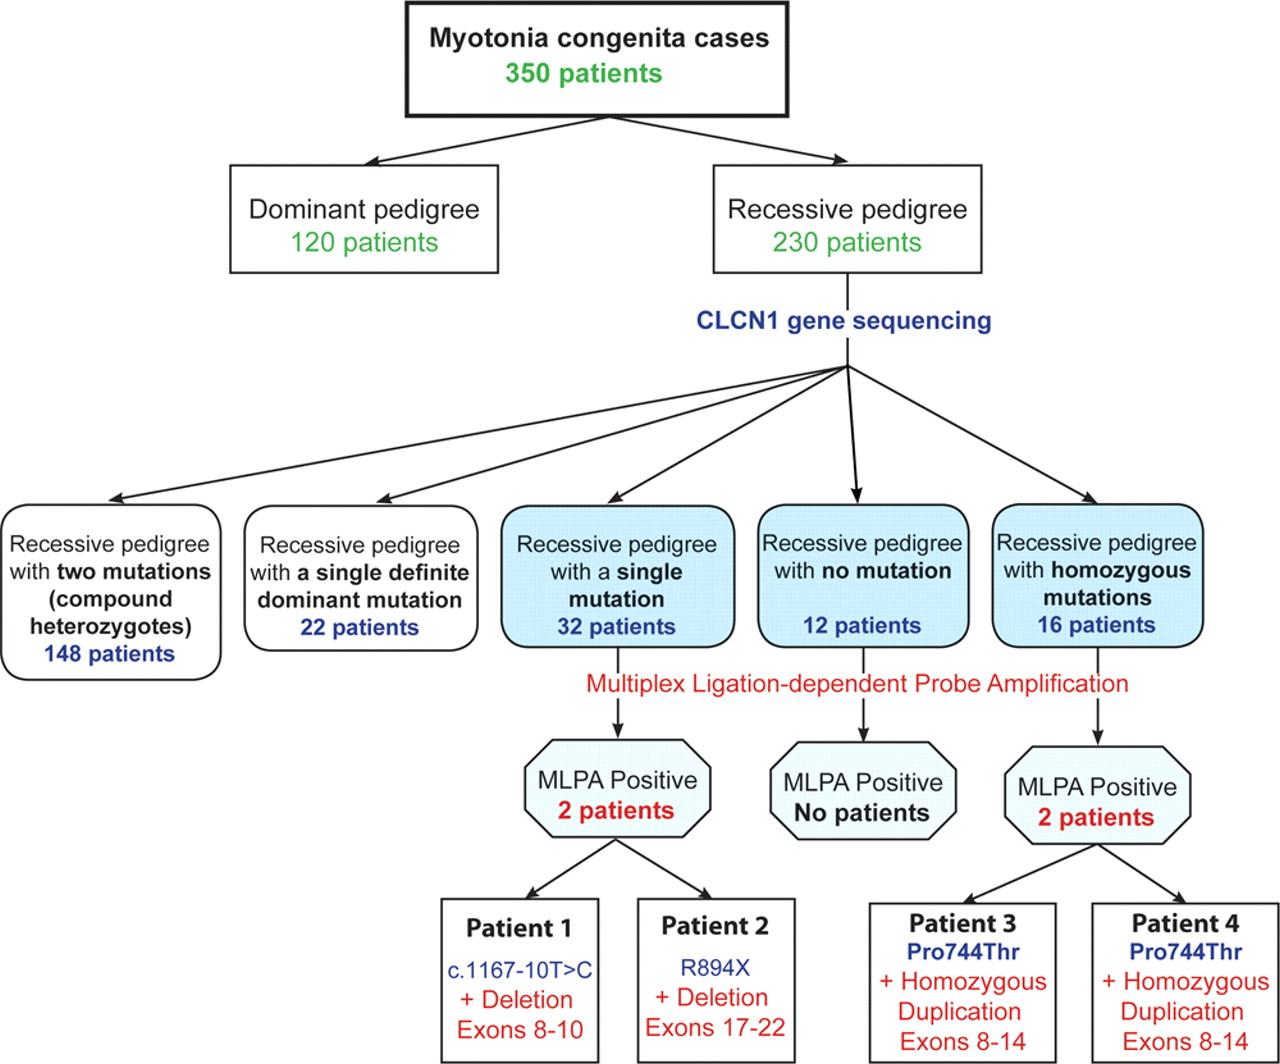 A new explanation for recessive myotonia congenita neurology download figure nvjuhfo Image collections